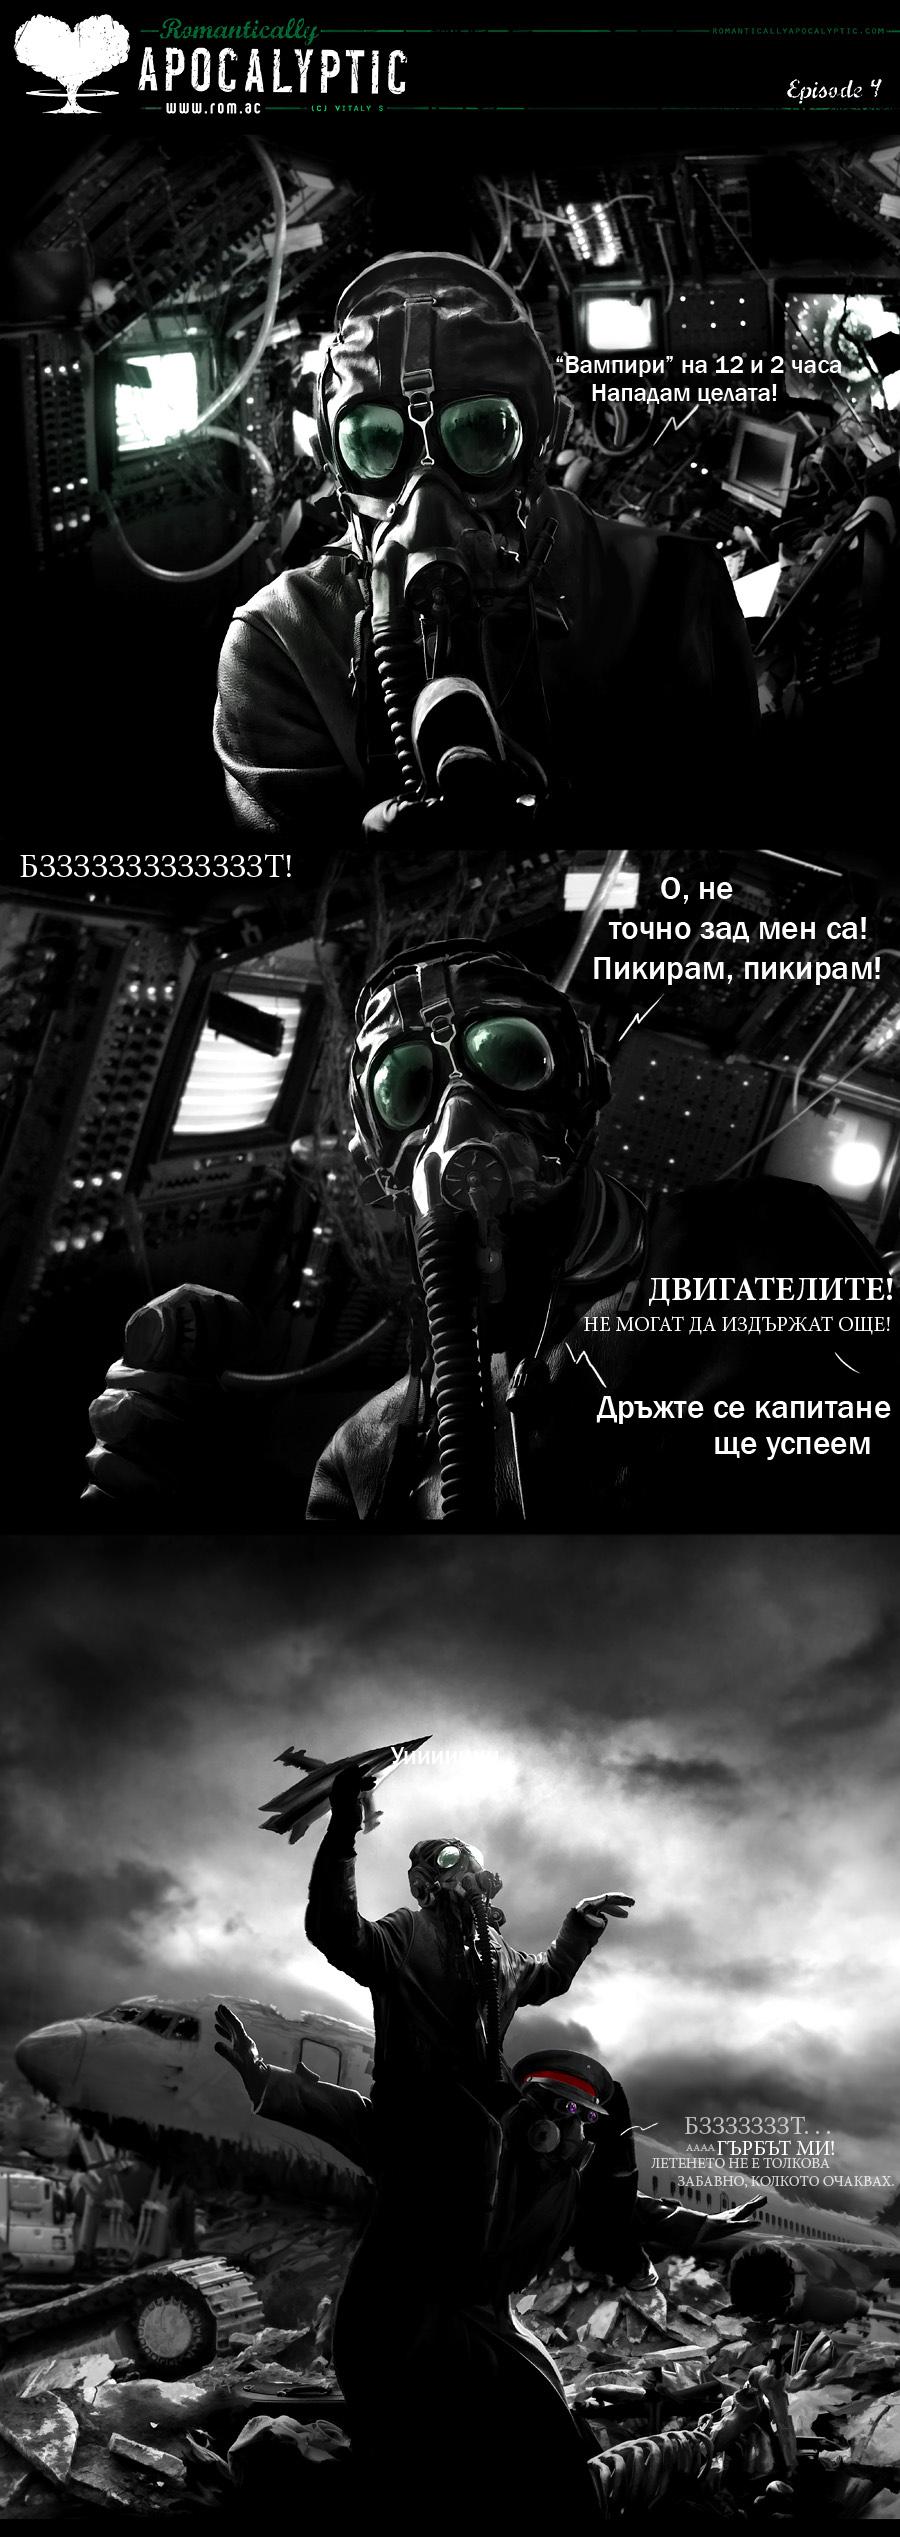 Romantically Apocalyptic 04 BG by latunov